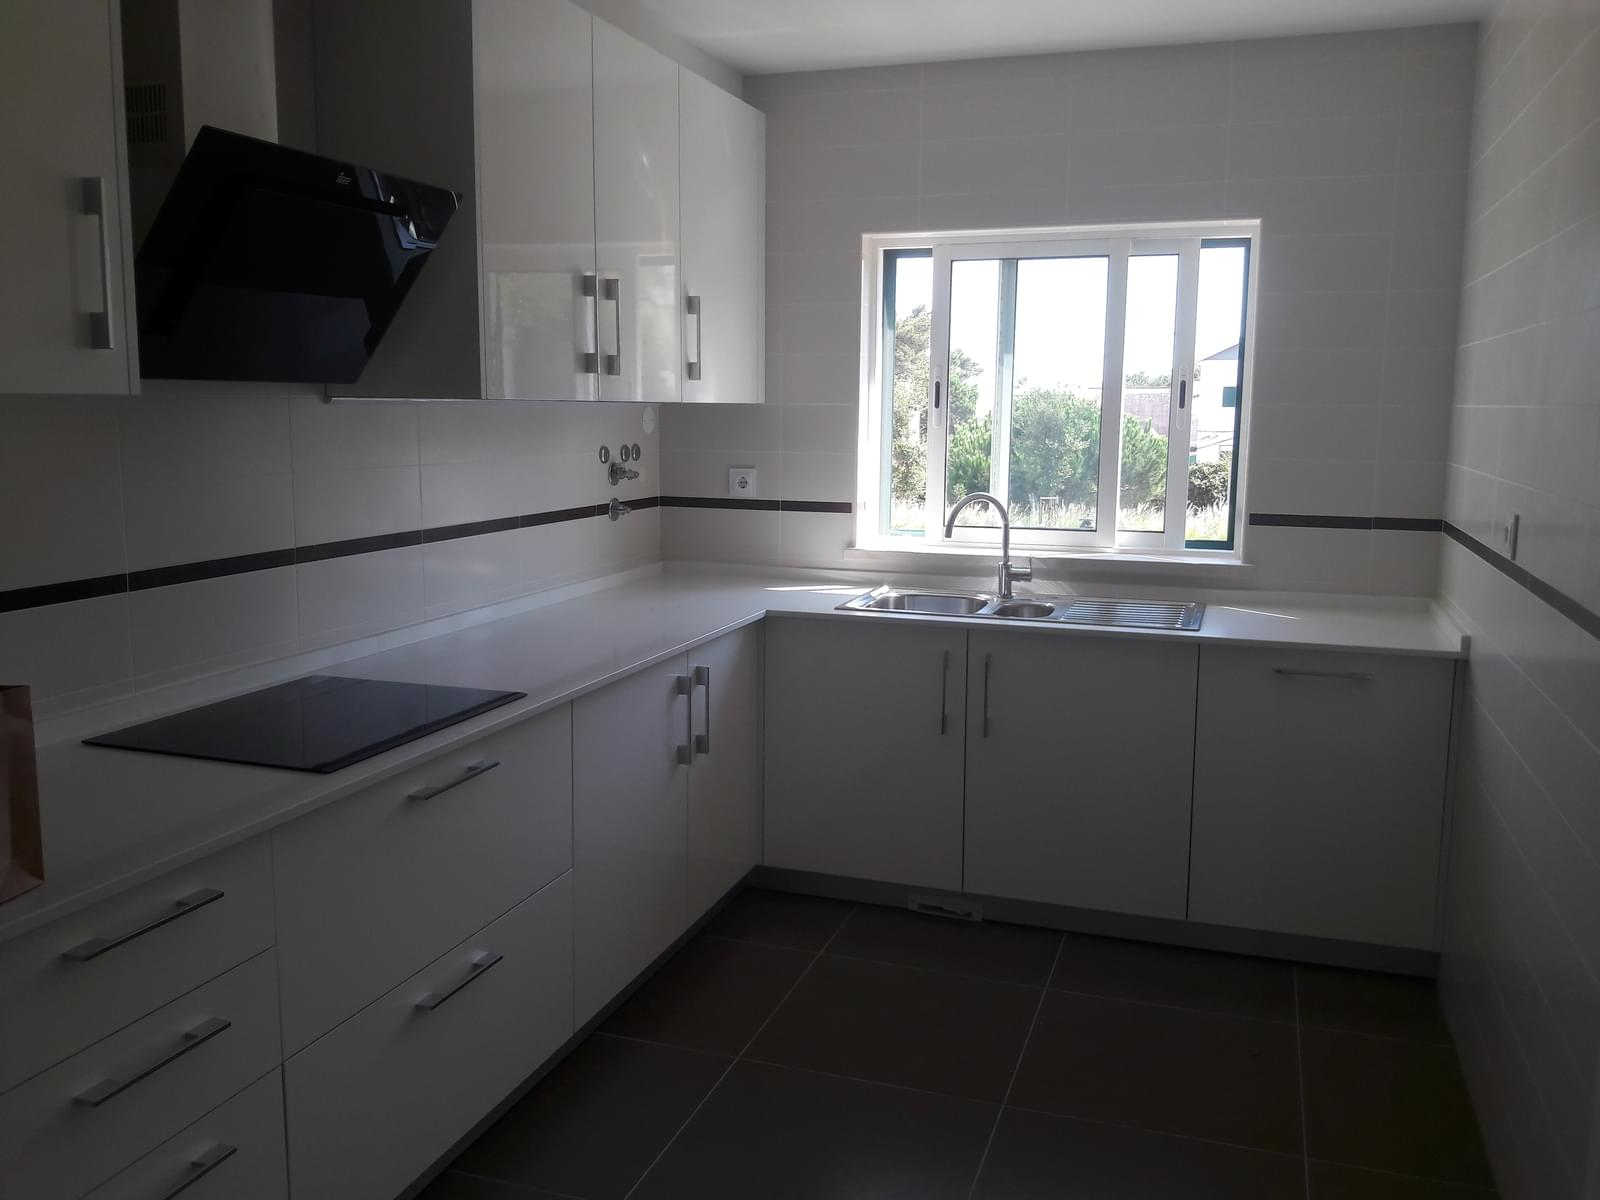 pf18025-apartamento-t3-eadf137d-7130-4d96-8556-cdee1c99f253